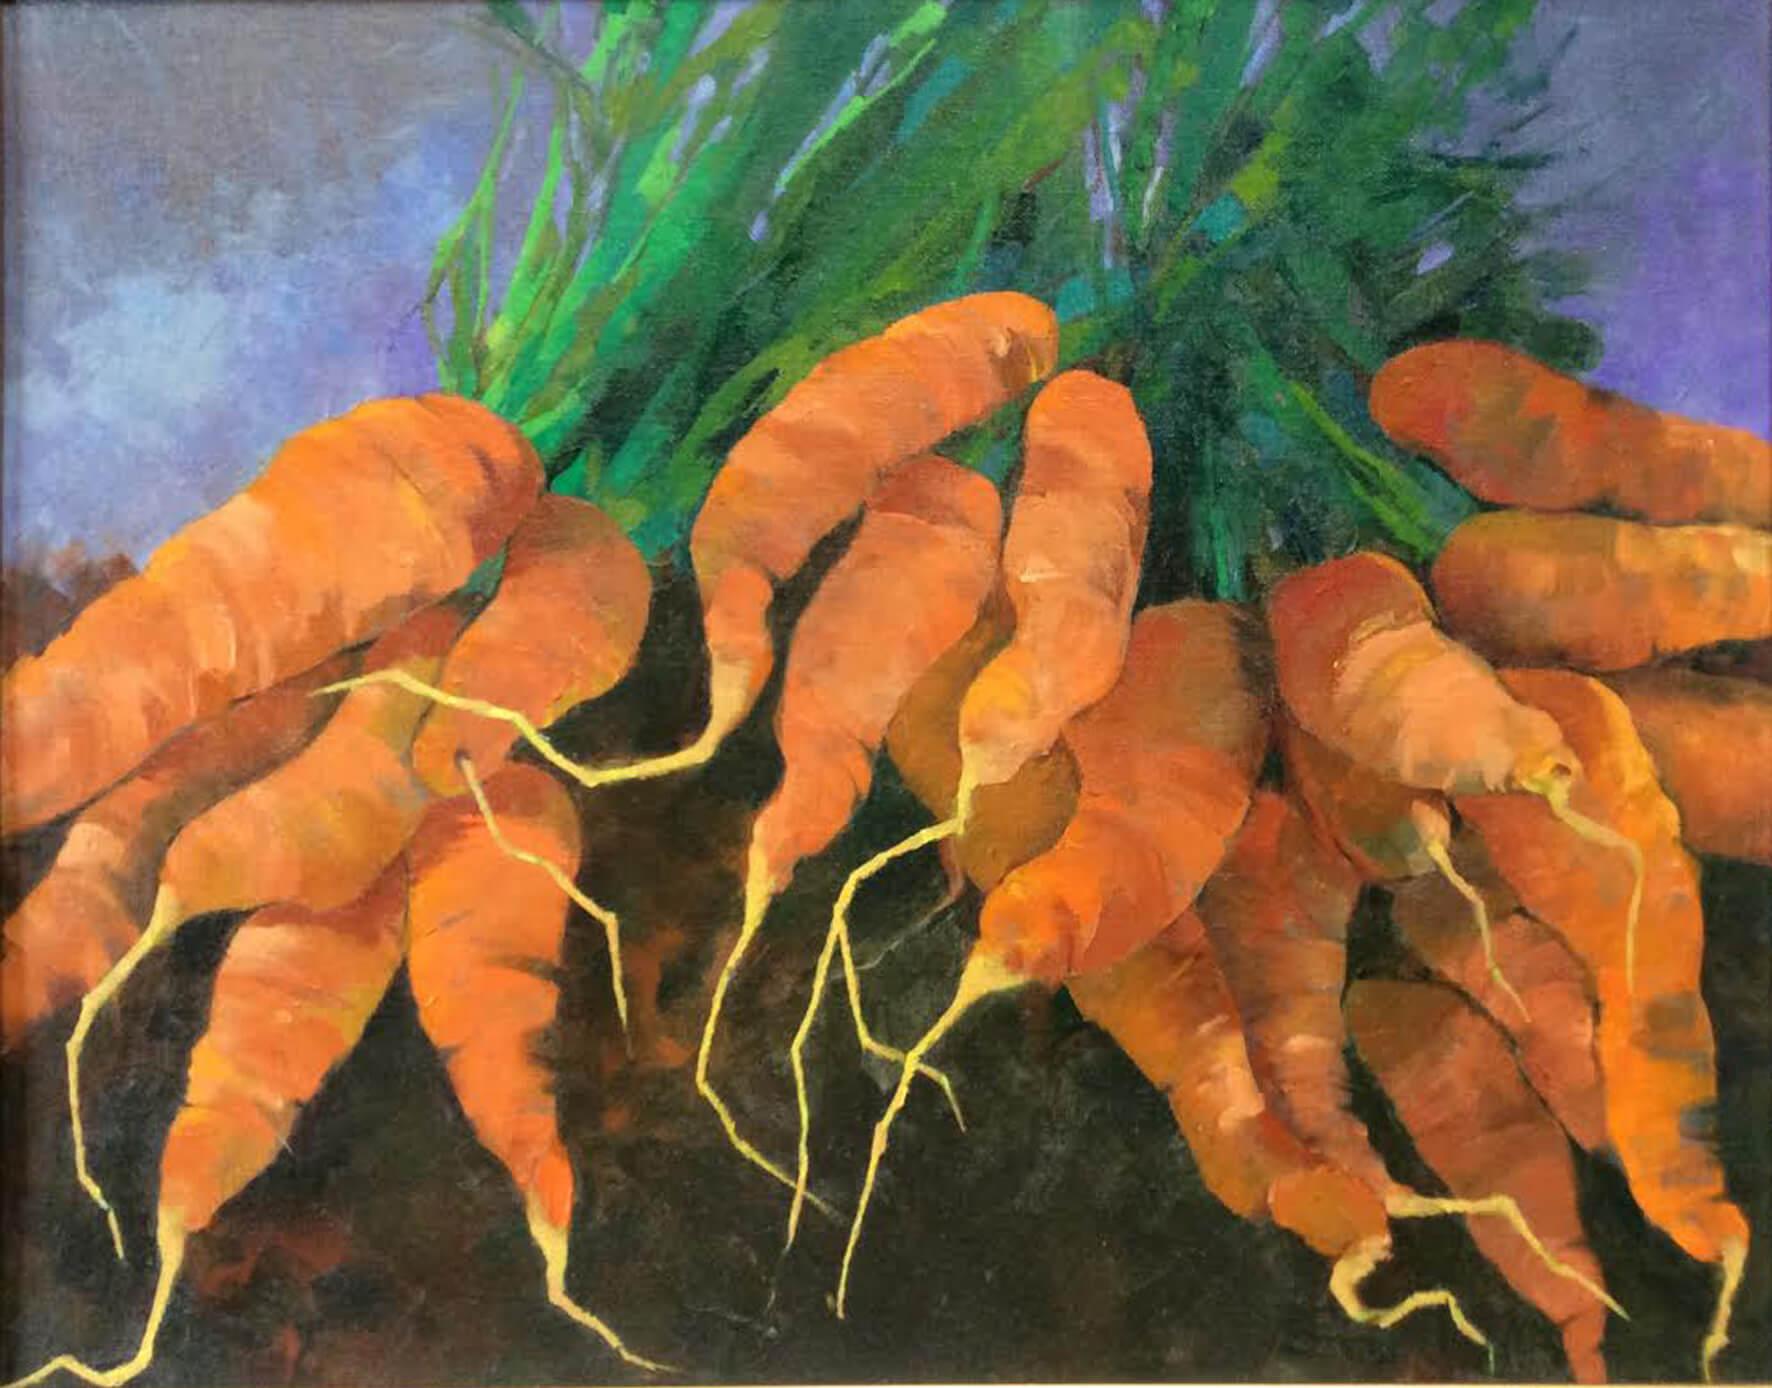 Judith Hazen - Carrot Frenzy